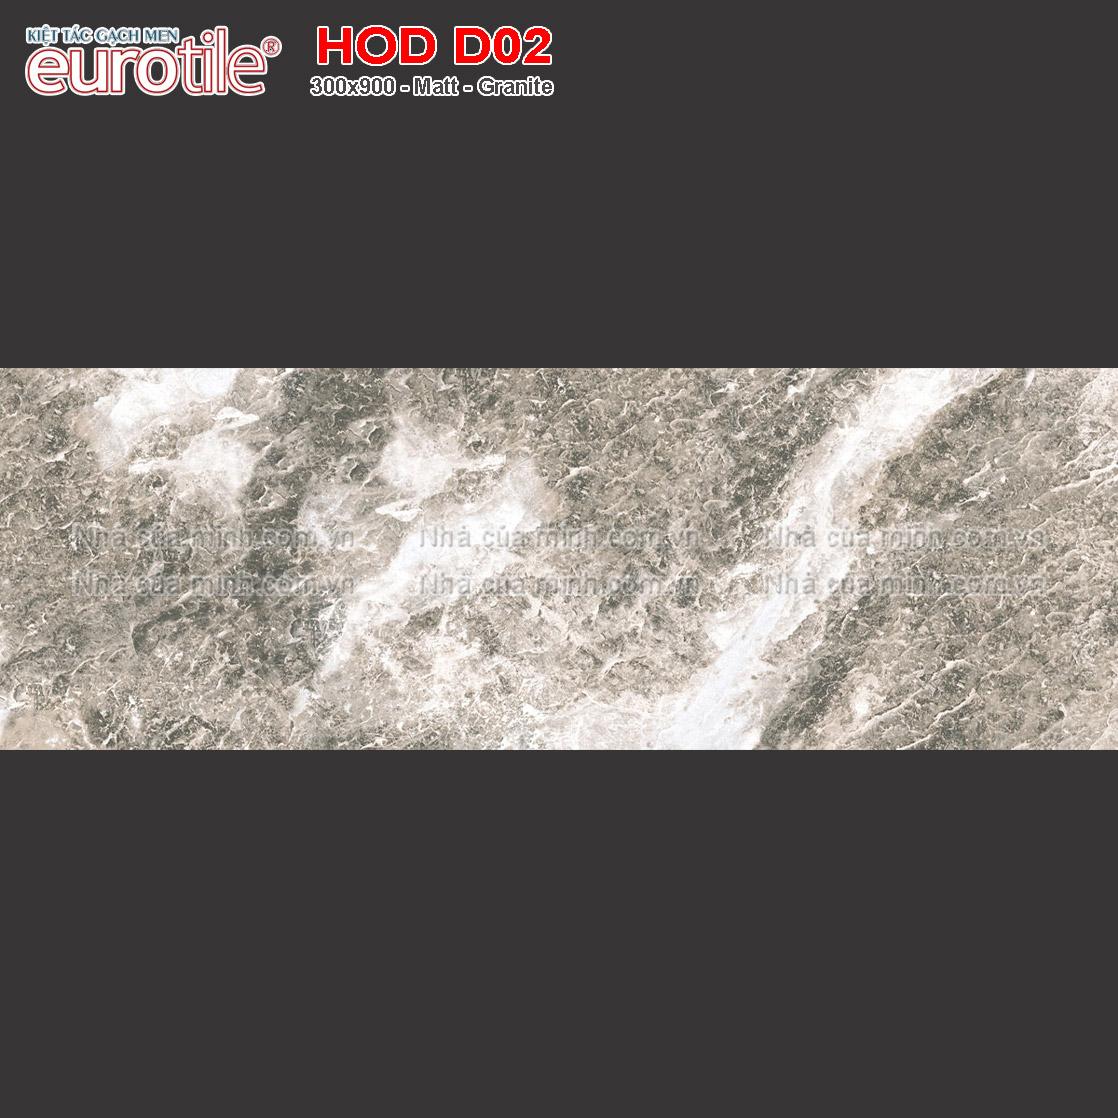 Gạch ốp lát 300x900 Eurotile Hoa Đá HOD D02 giá rẻ